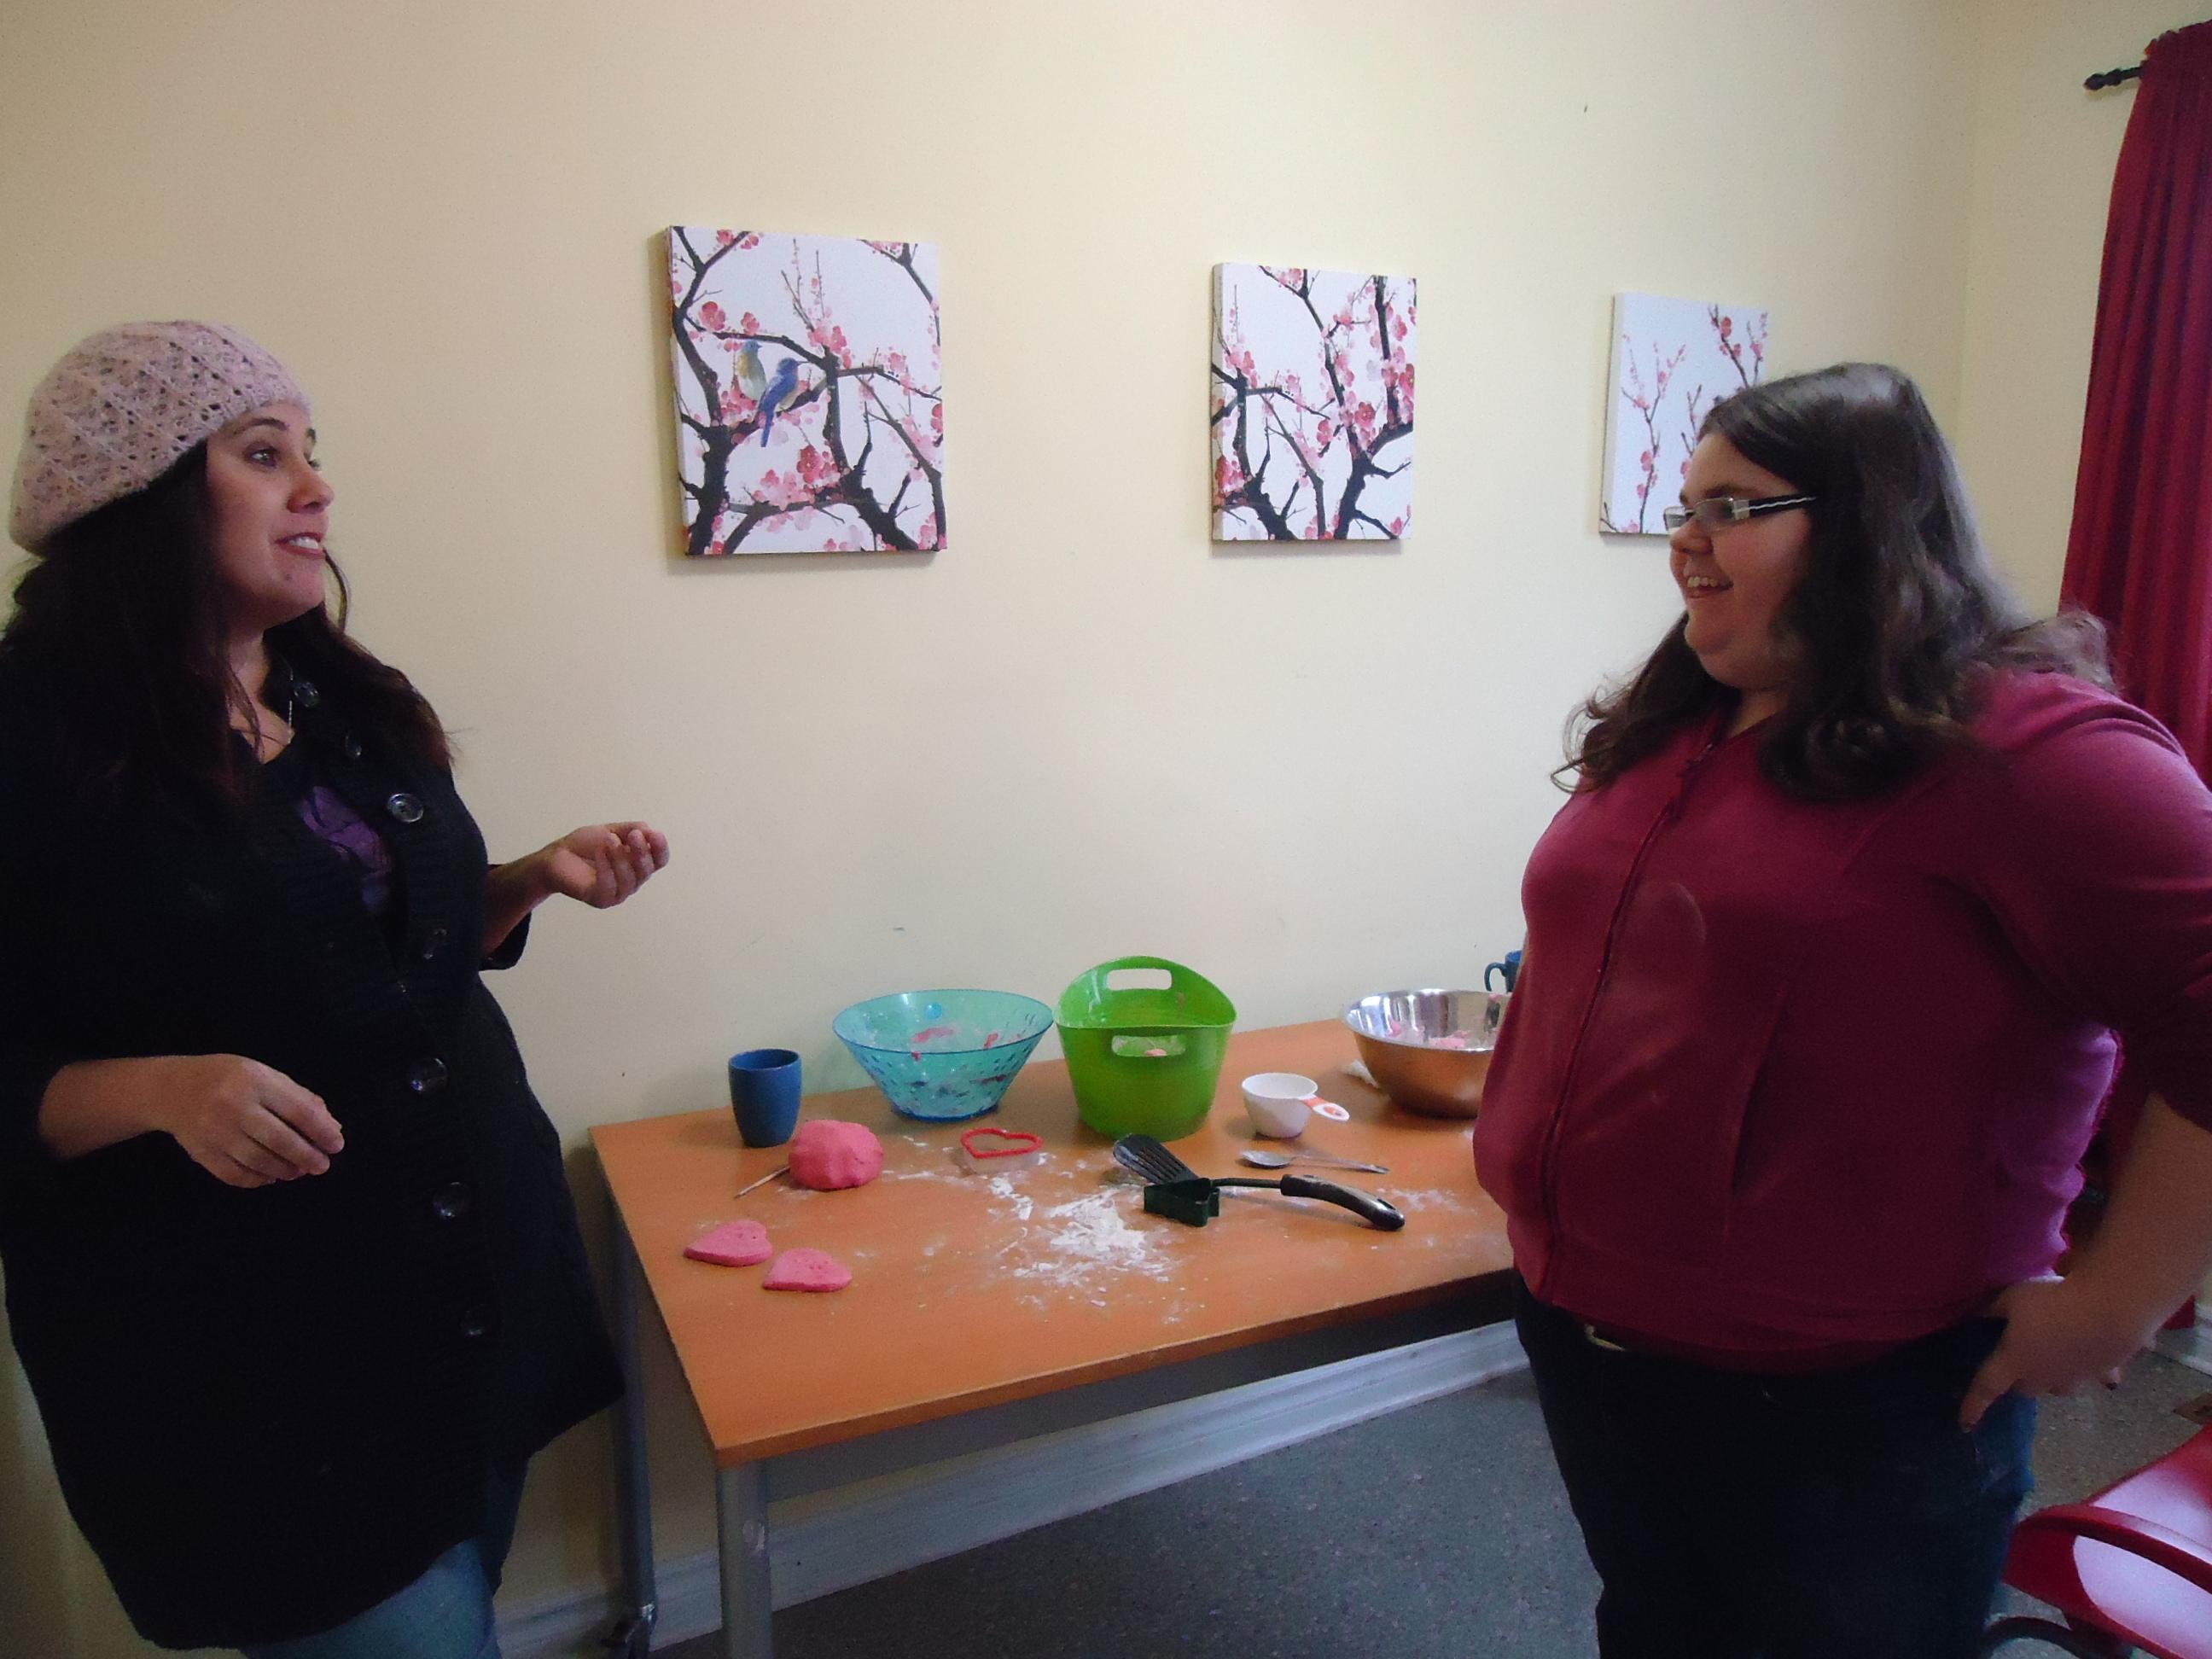 Play Dough Christmas Craft Ideas Linda Chisholm Word Press